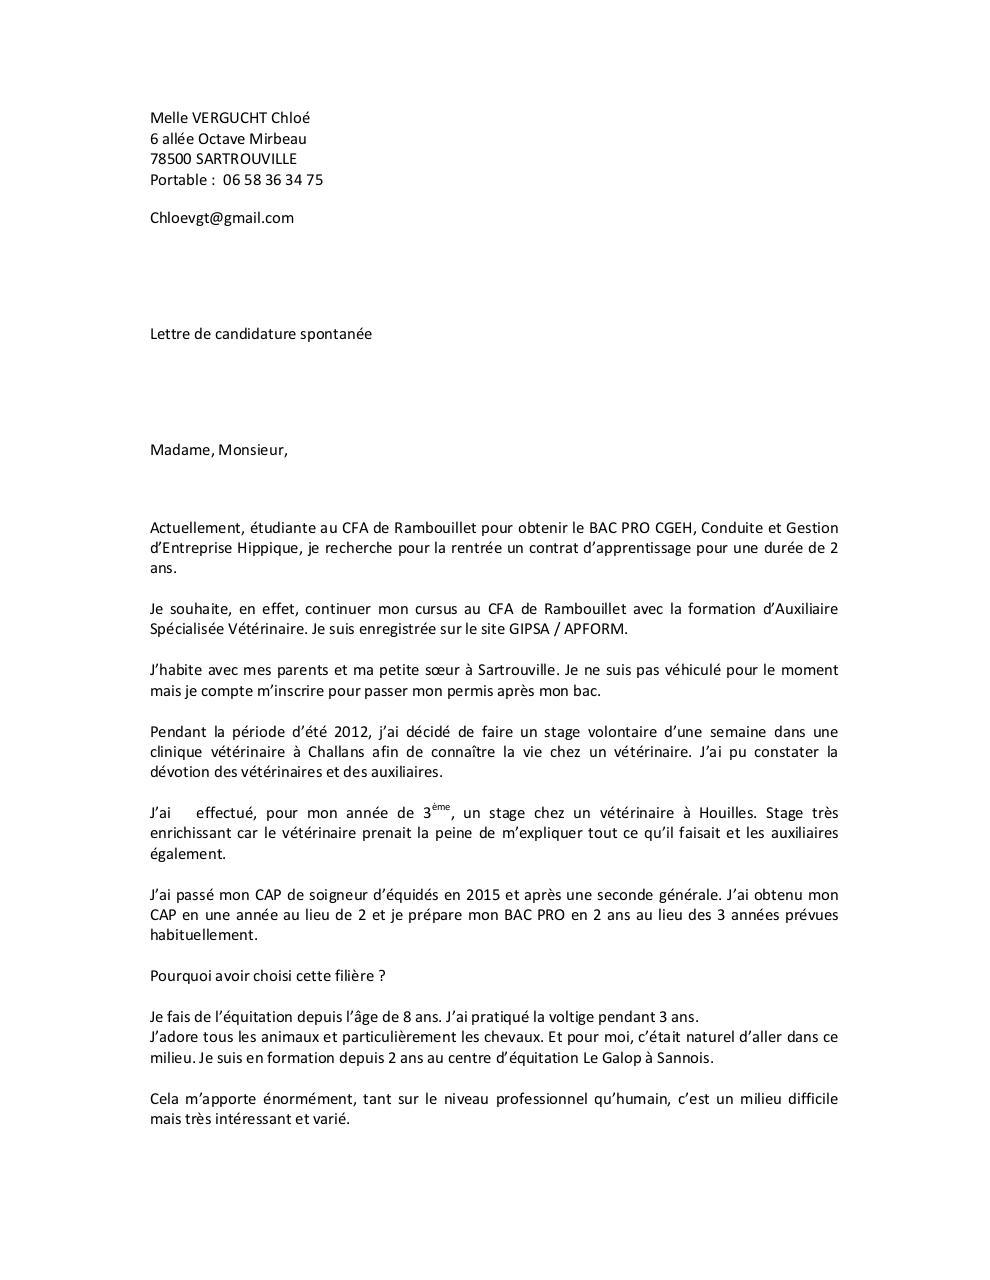 Vergucht Chlo 351 Contrat Apprentissage Docx Par Cdautry